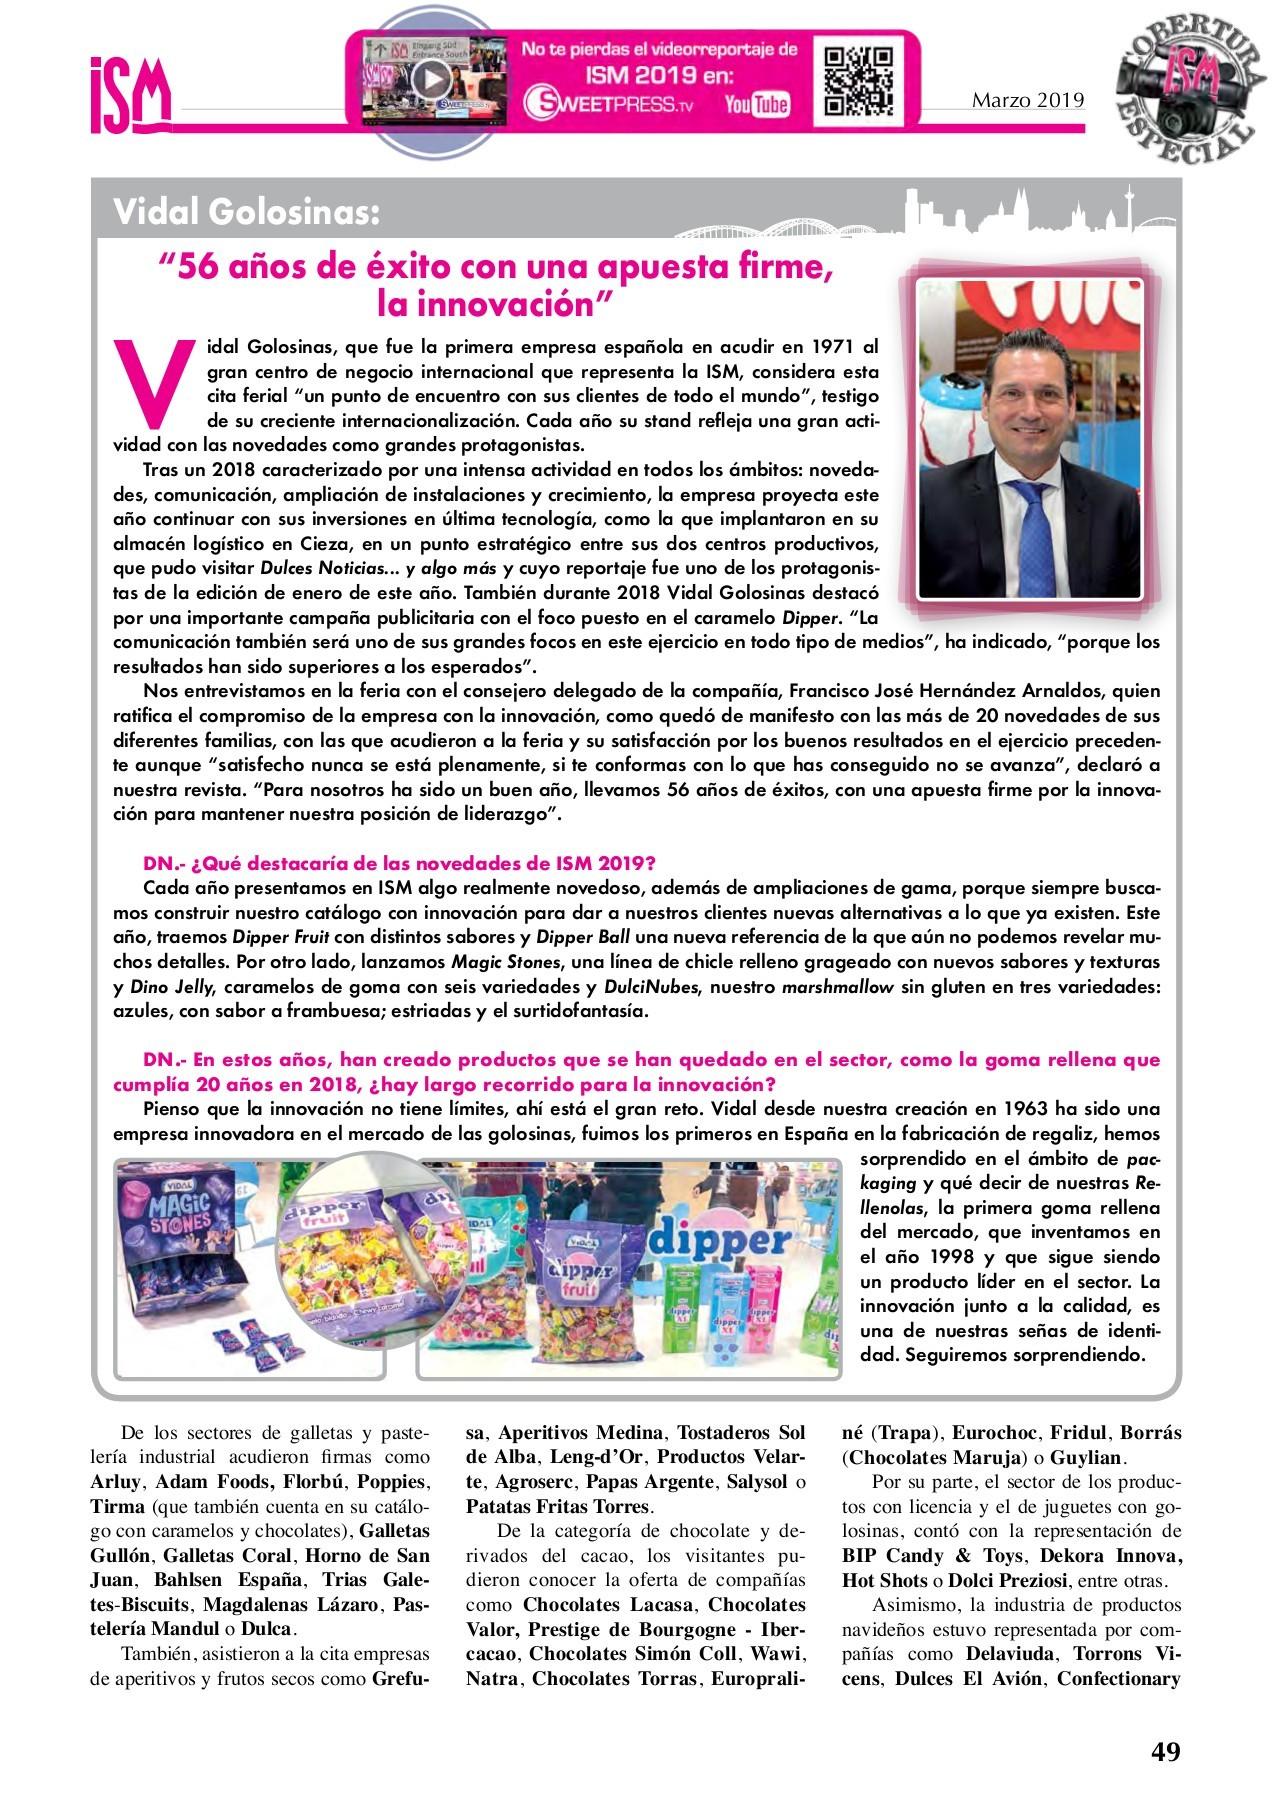 Citas Online Extranjeros 649688